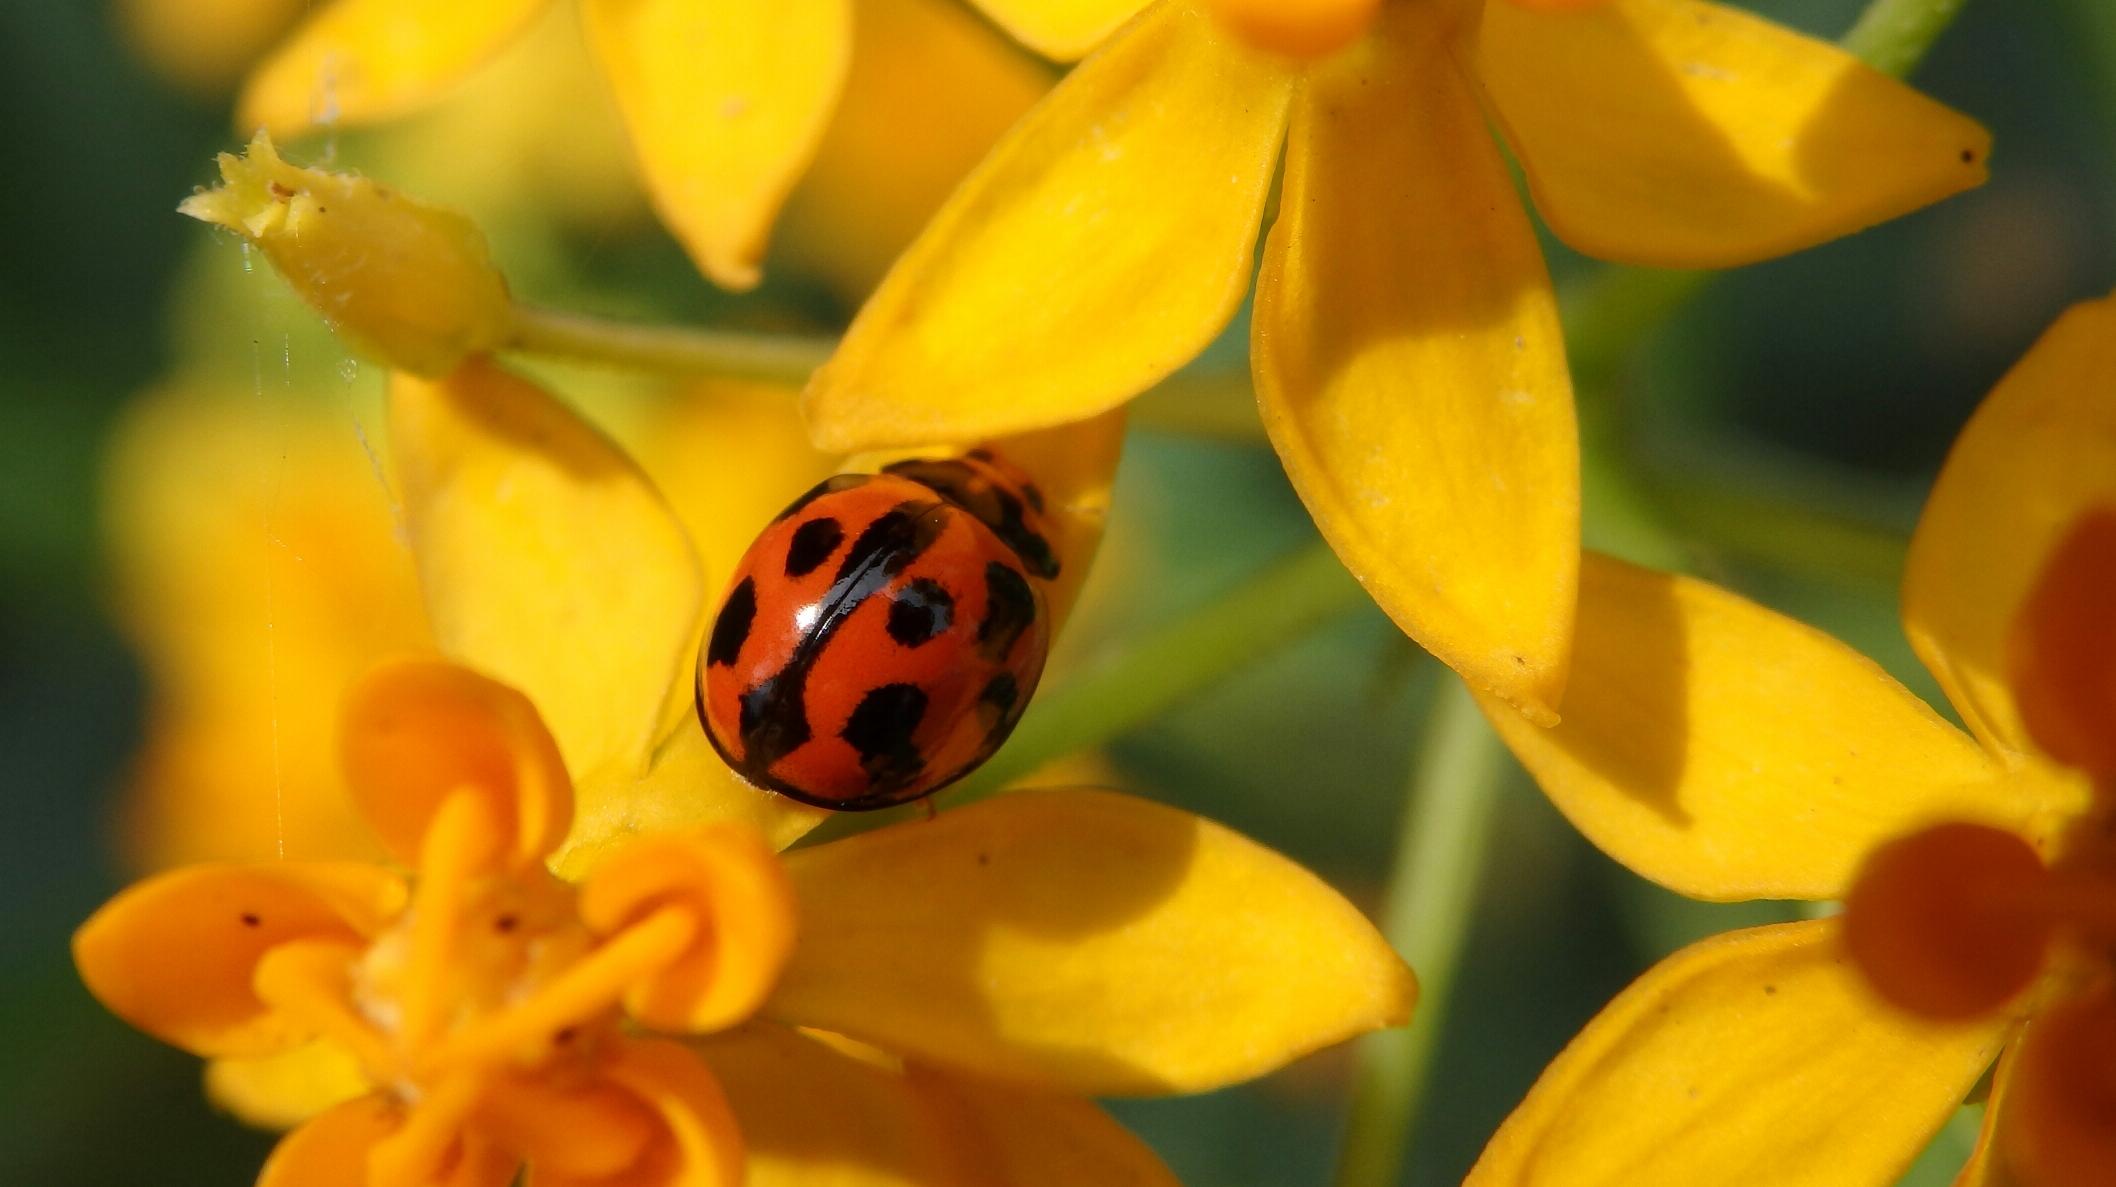 6. Ladybird beetles (family Coccinellidae)